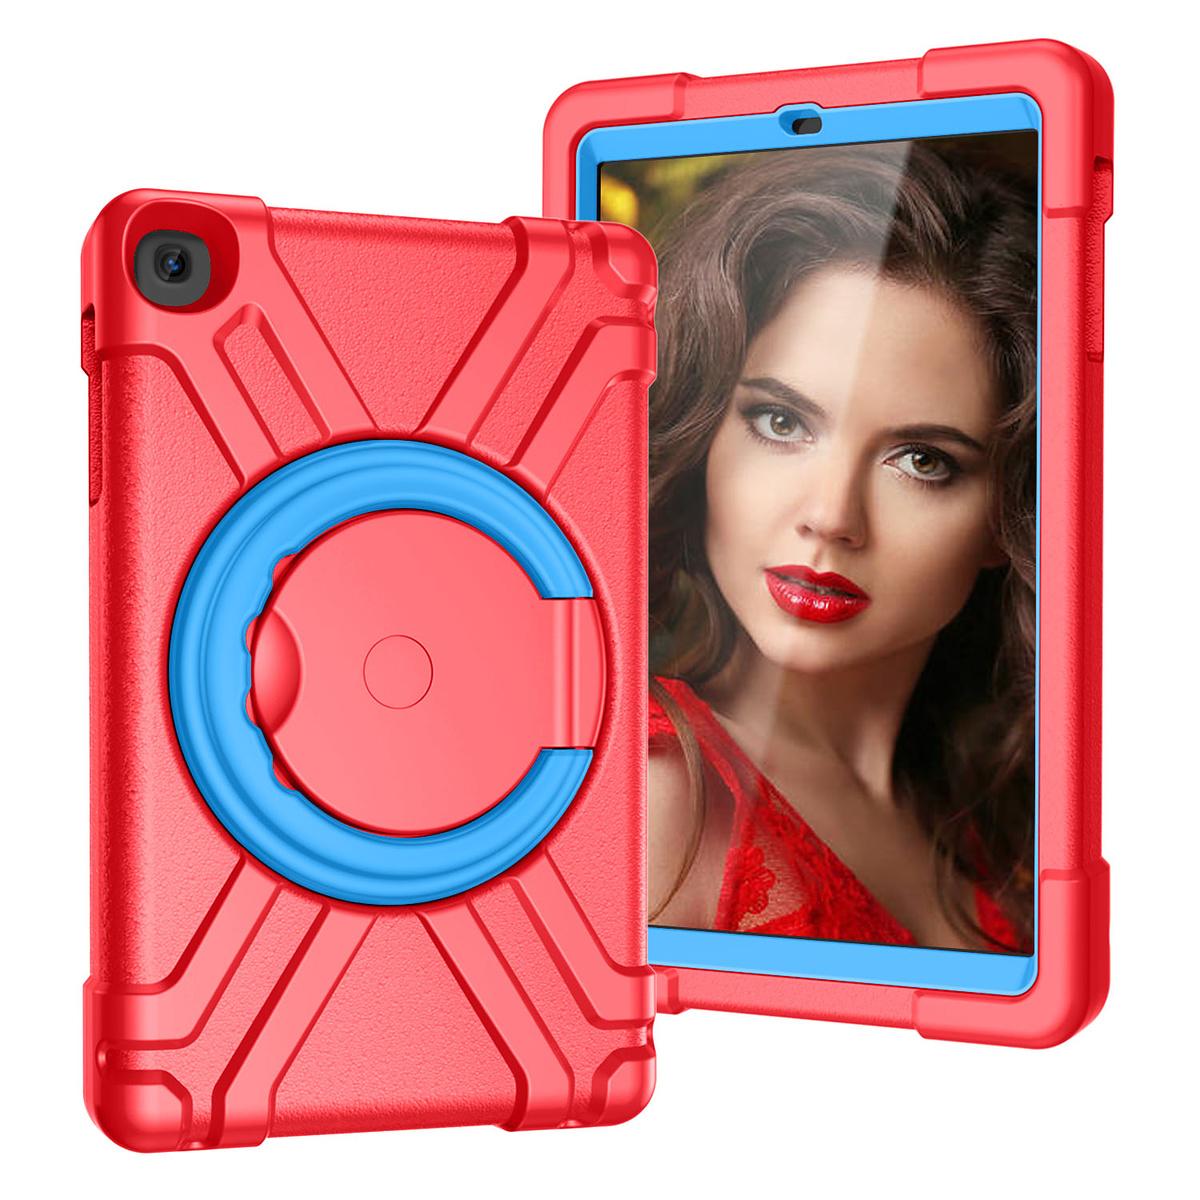 Barnfodral, Samsung Tab A 10.1 (2019), röd/blå